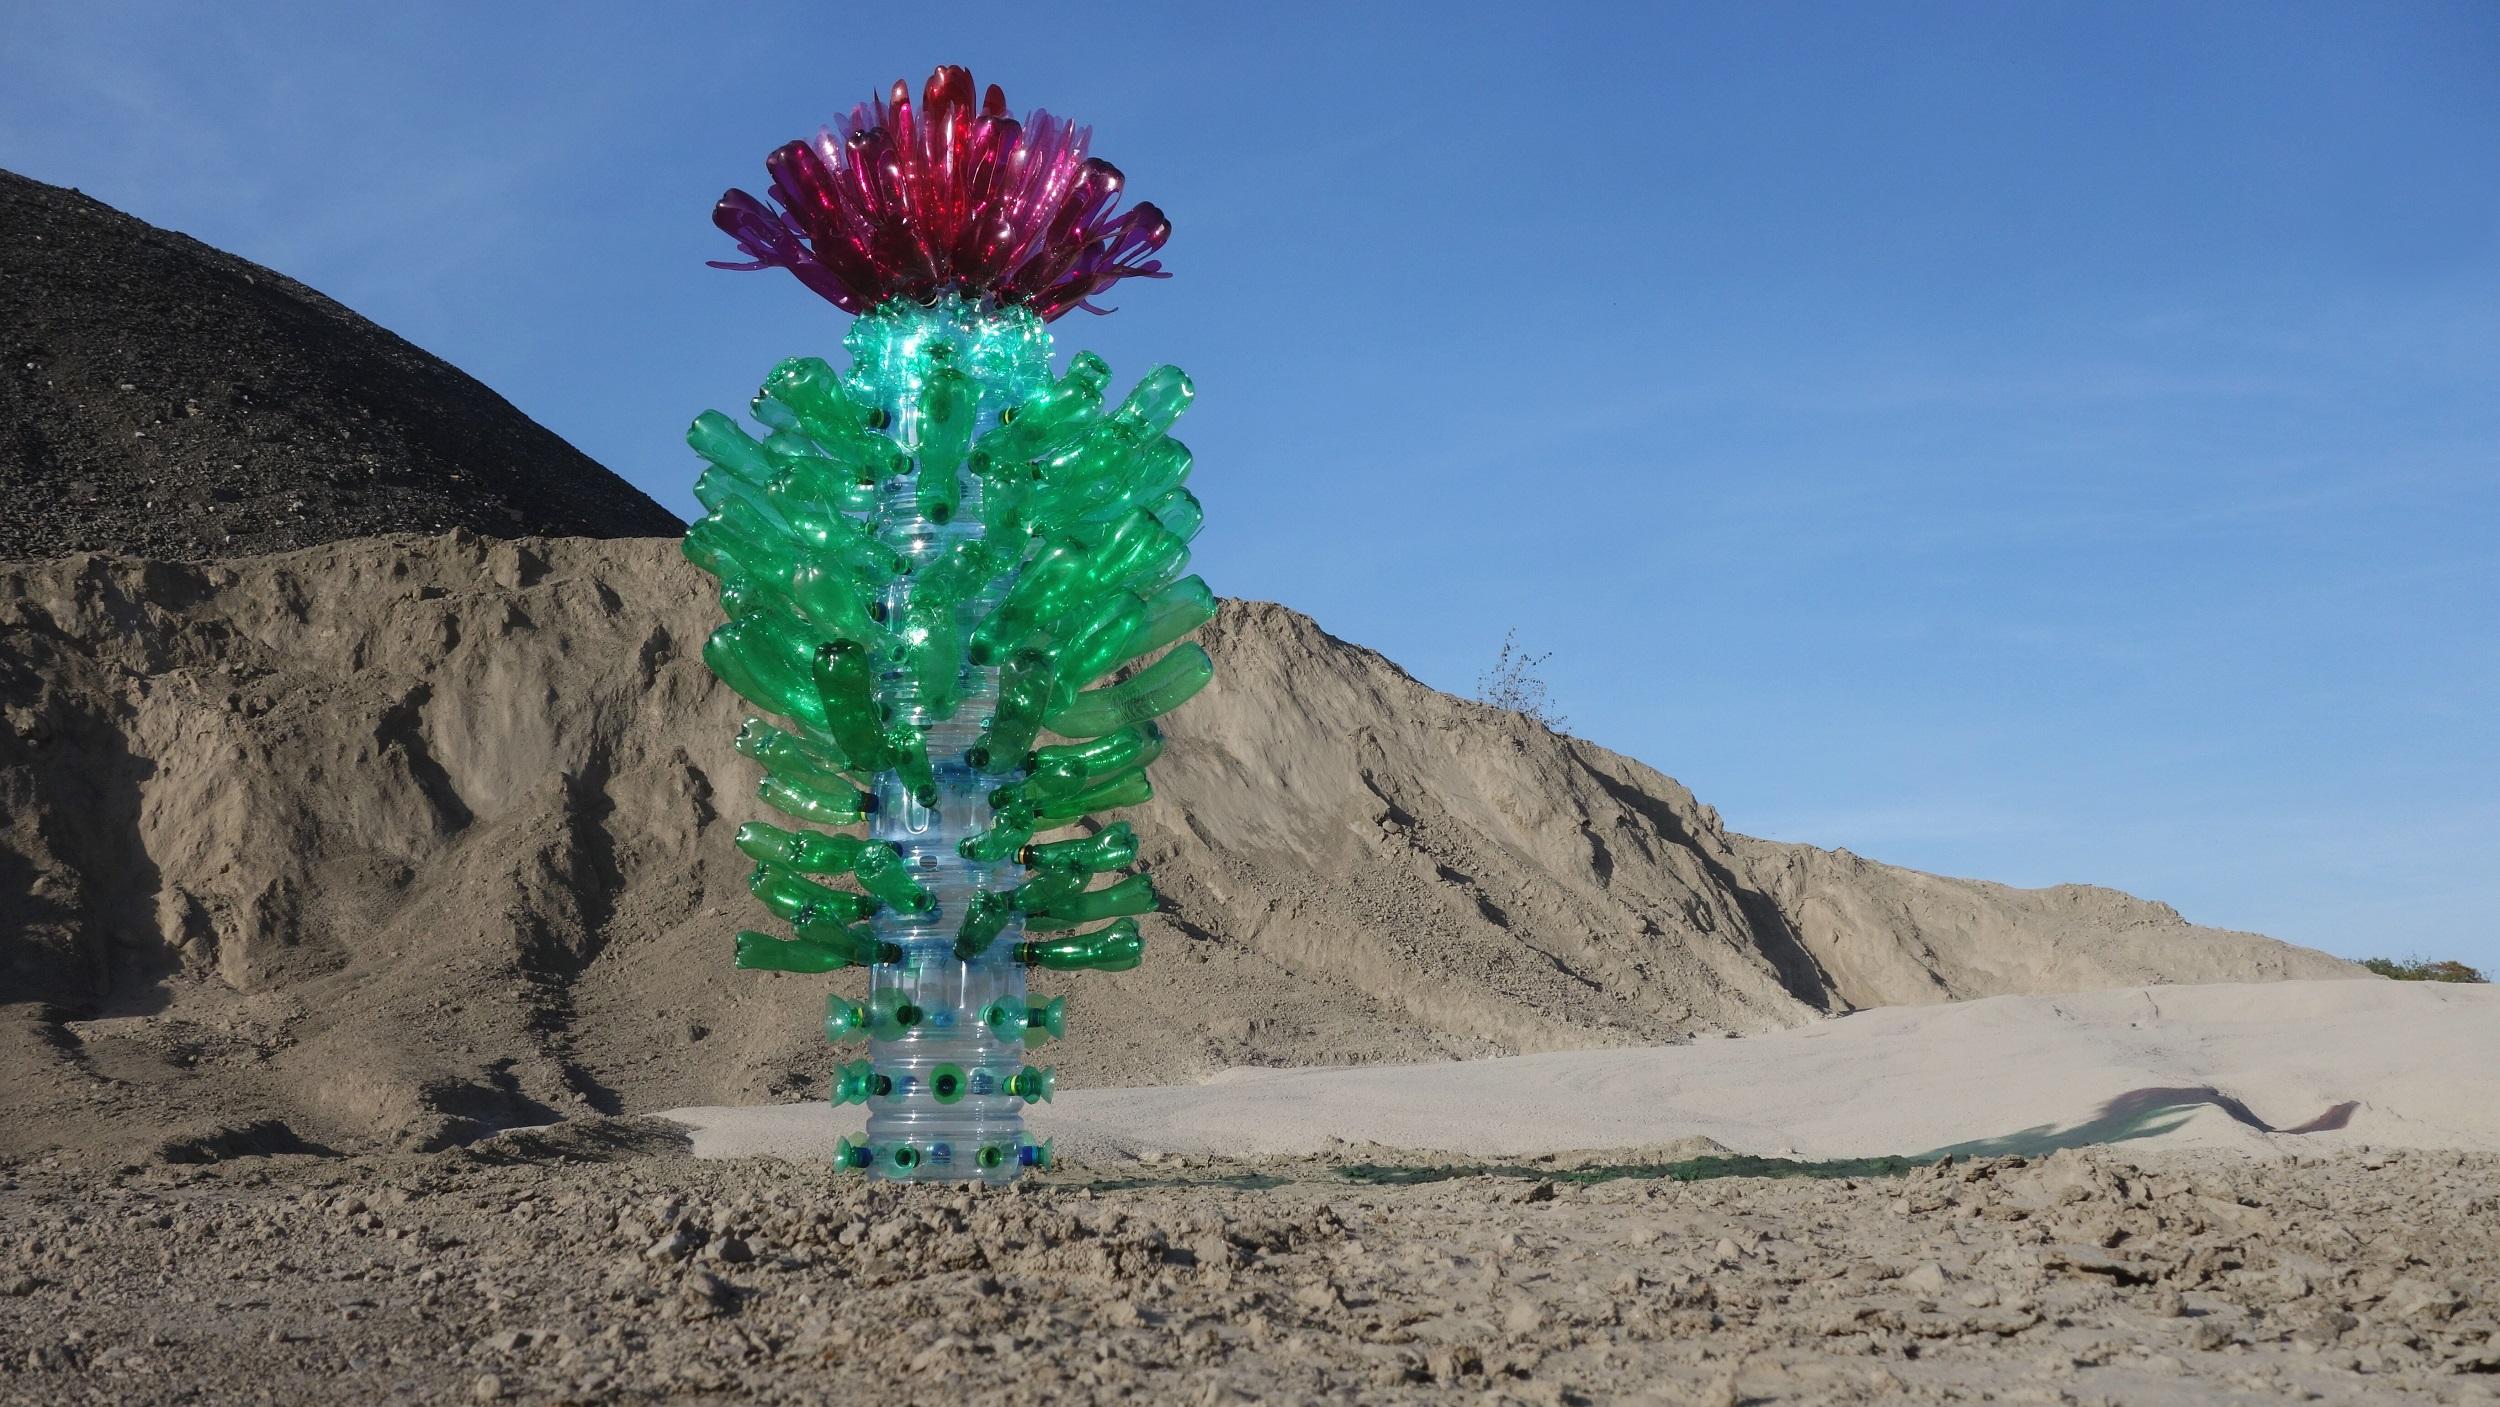 Kaktus in plastica riciclata di Veronika Richterová